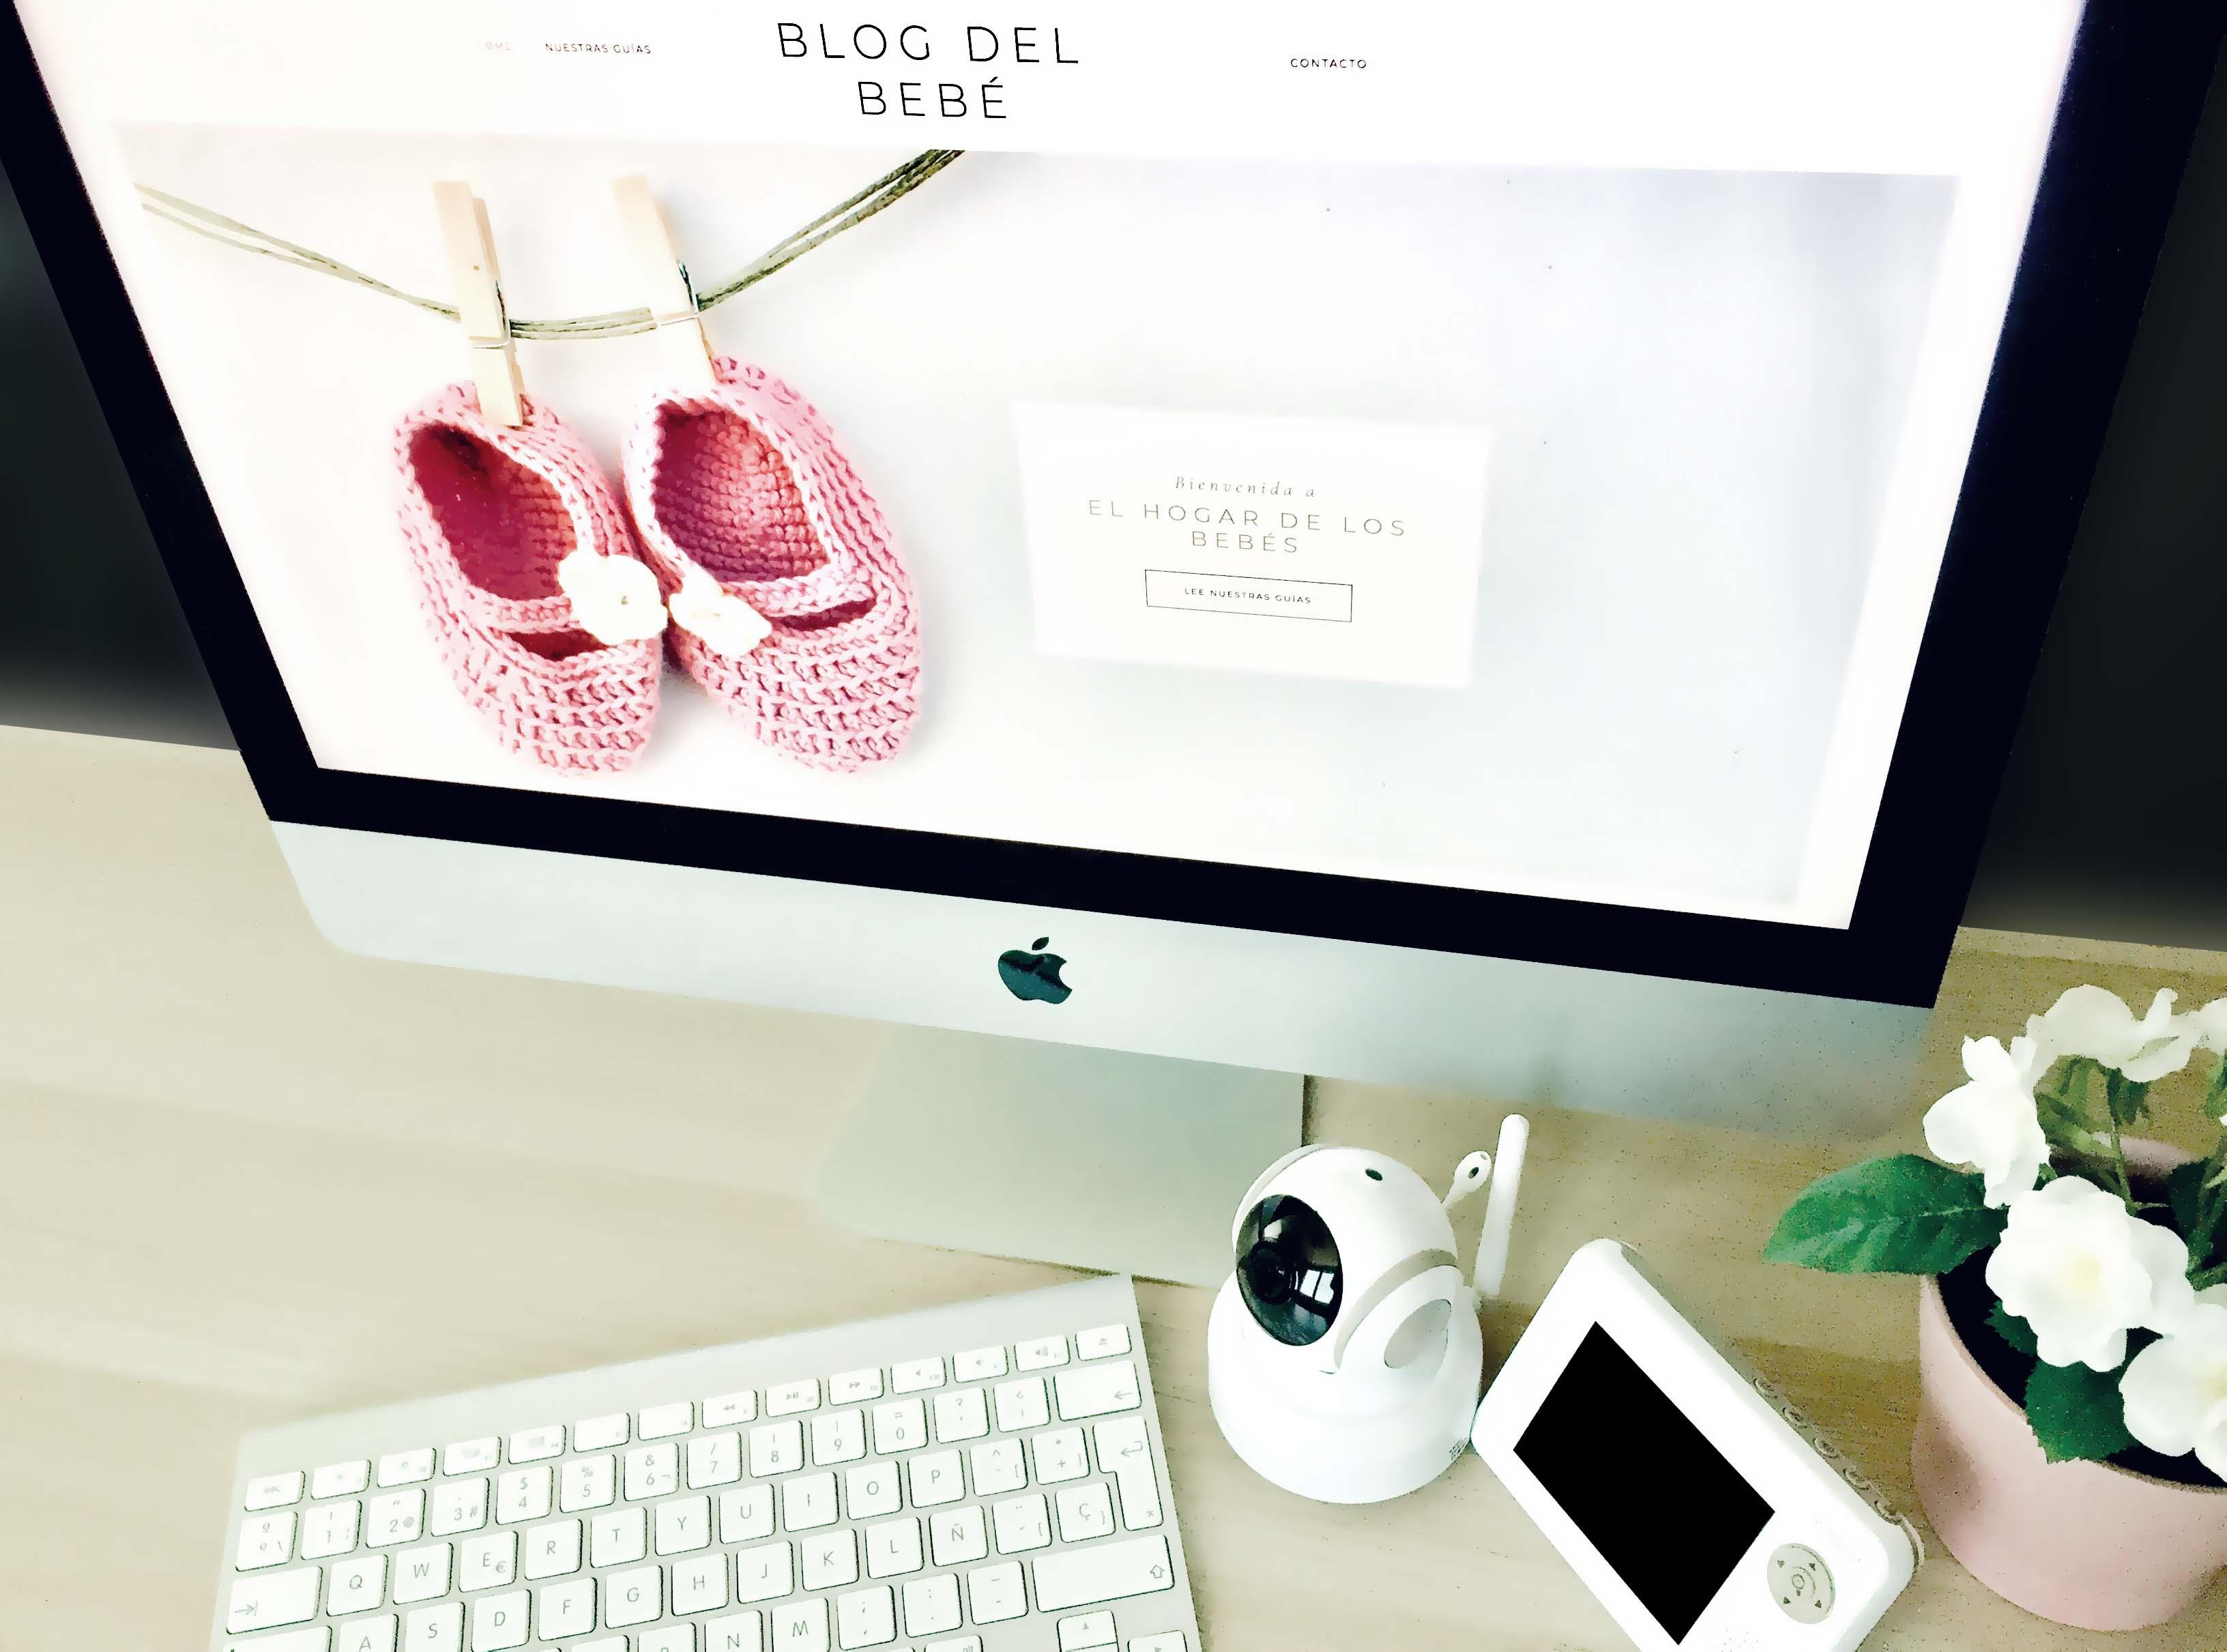 mejor vigilabebés en Blog del bebé